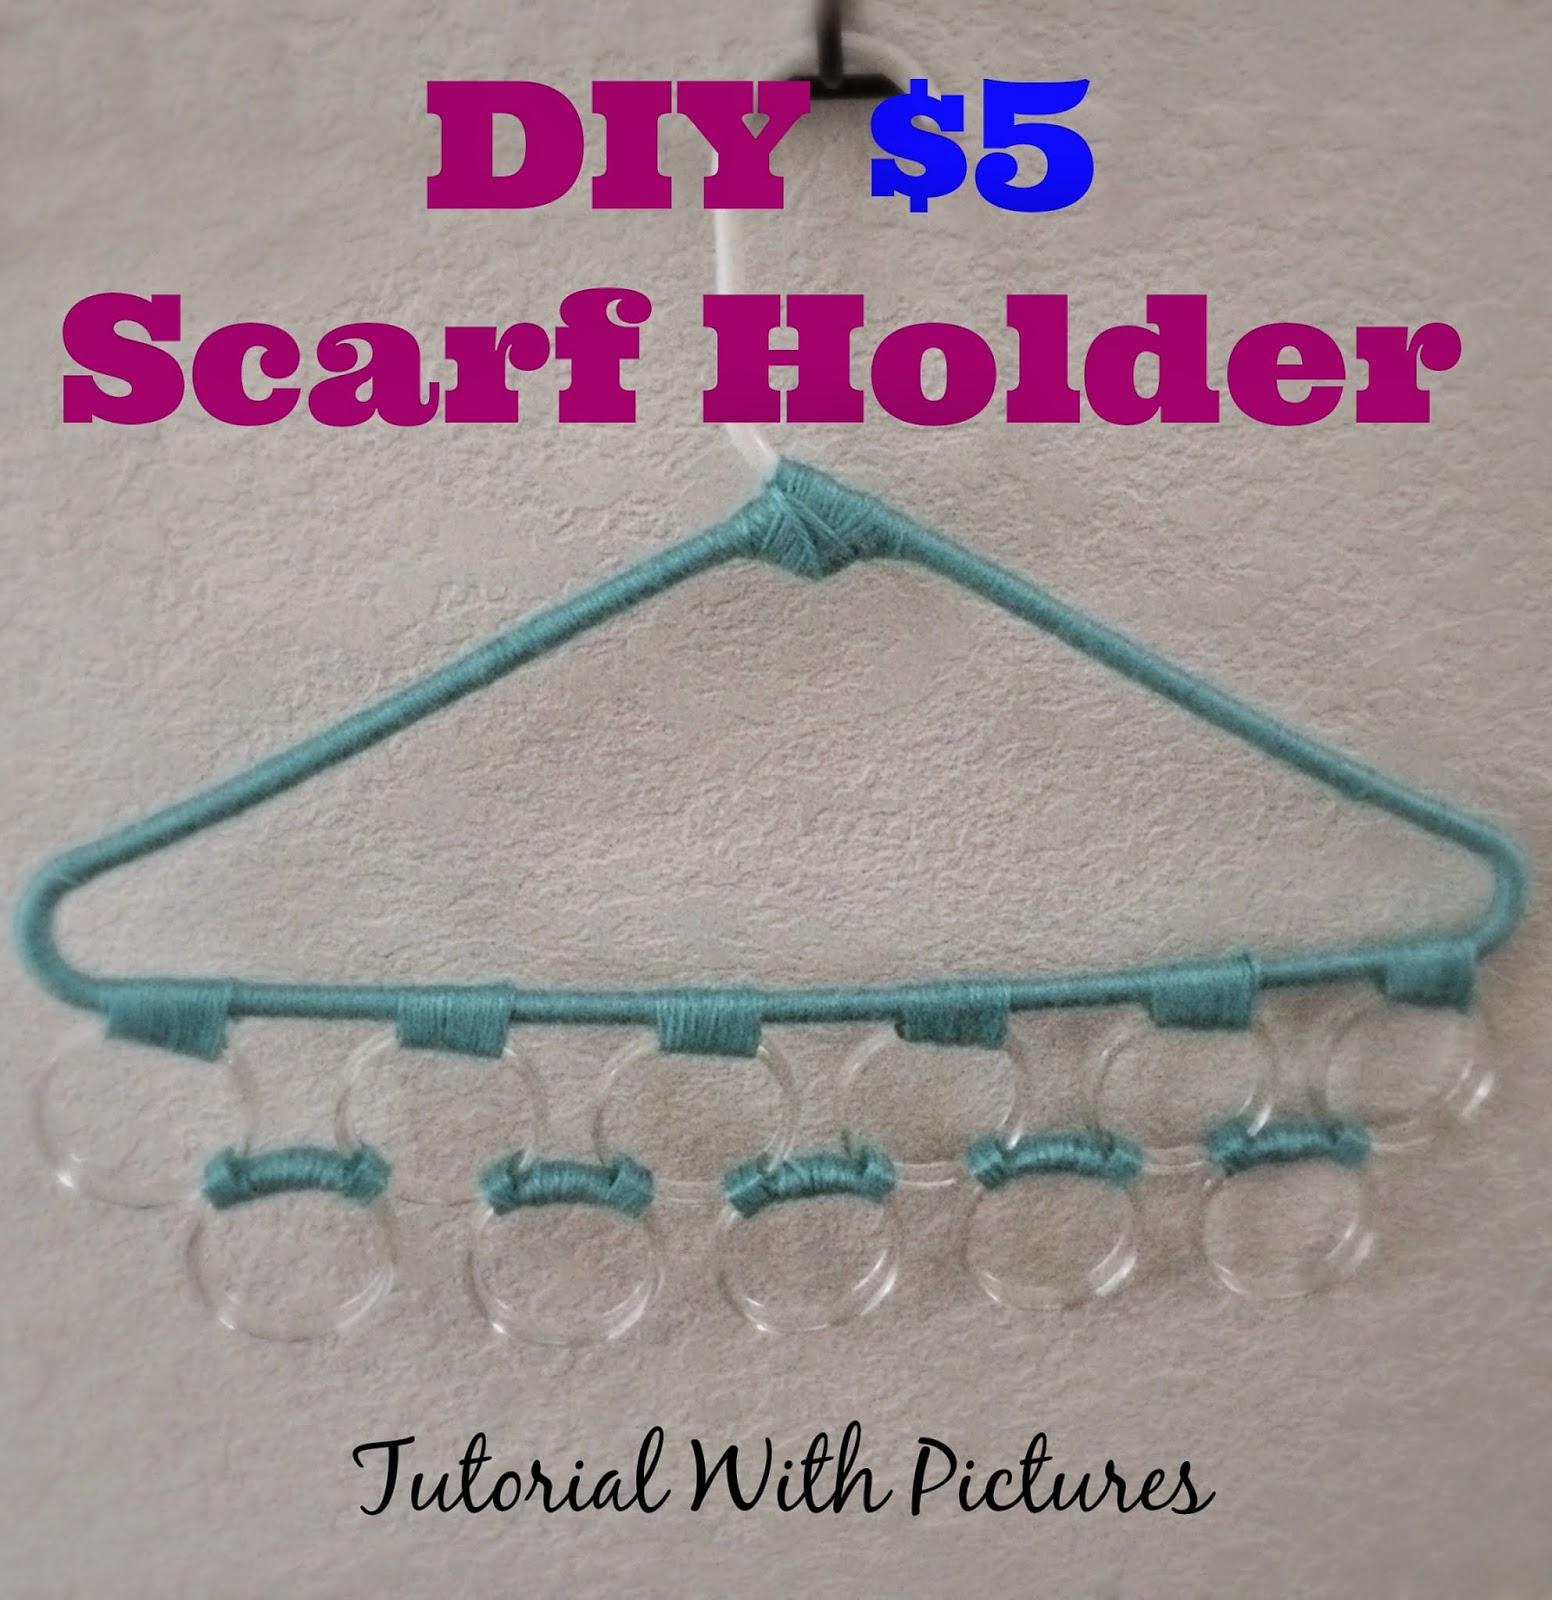 DIY $5.00 Scarf Holder |We Got the FUNK